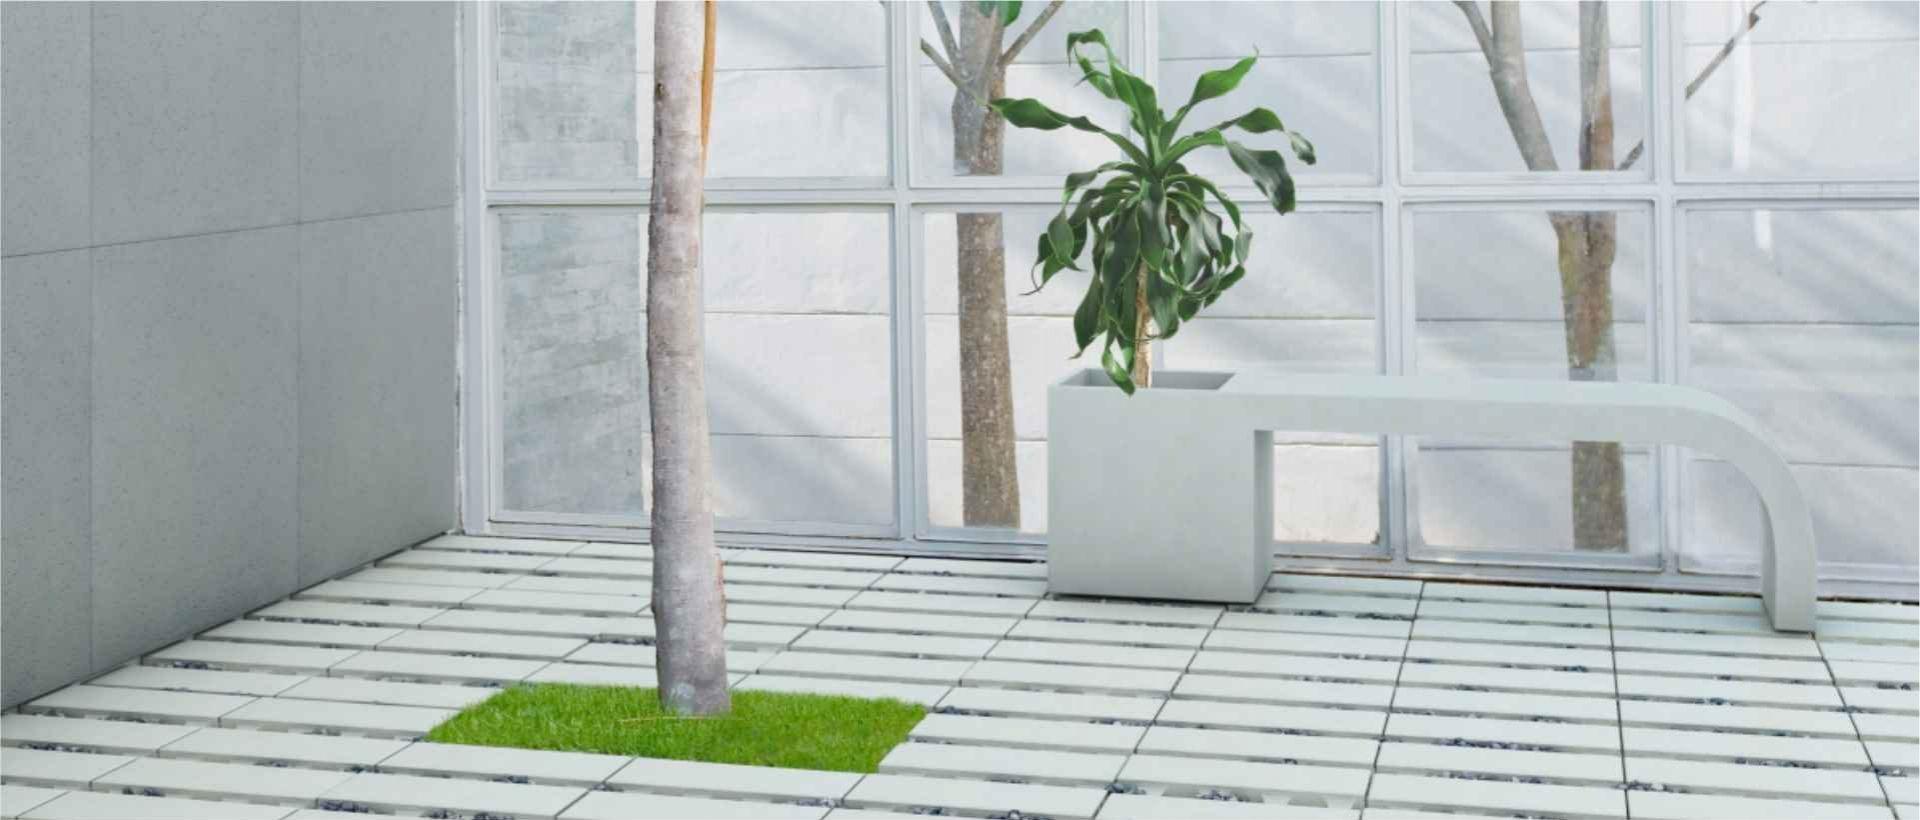 Bench-planter Harmony, ecoSolid slabs, Modern Line